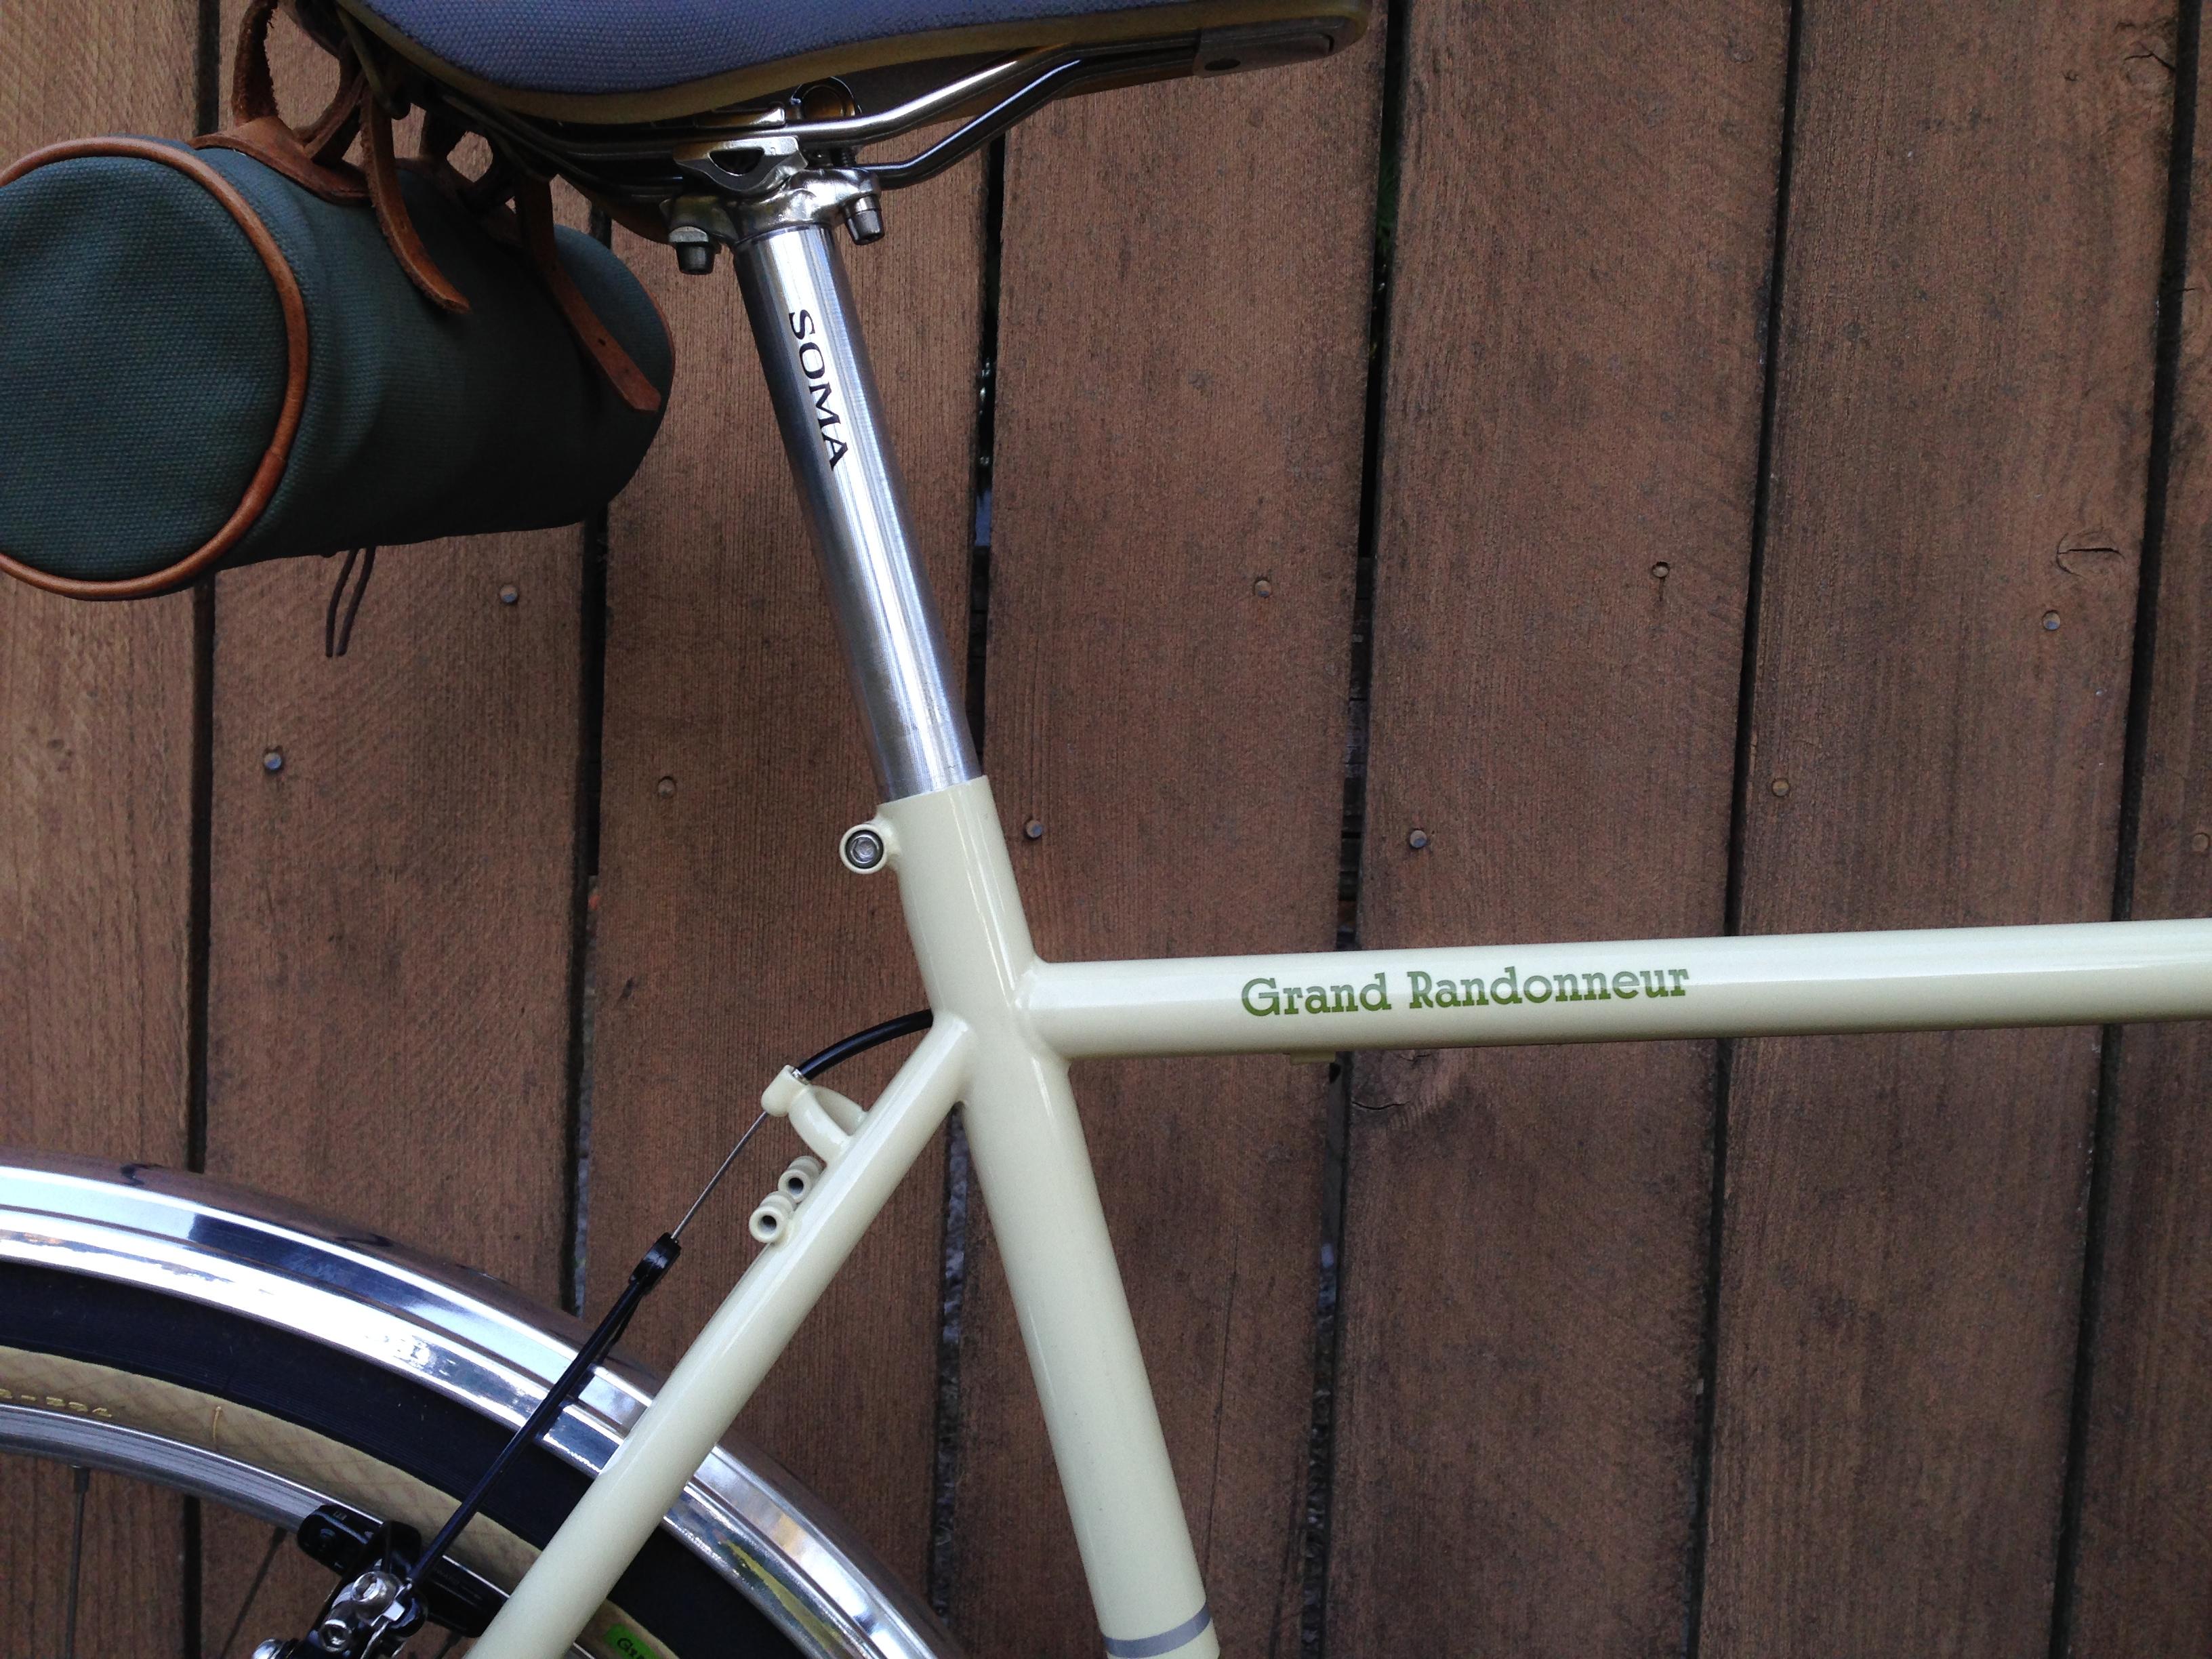 Grando | Paul\'s Bike Rides